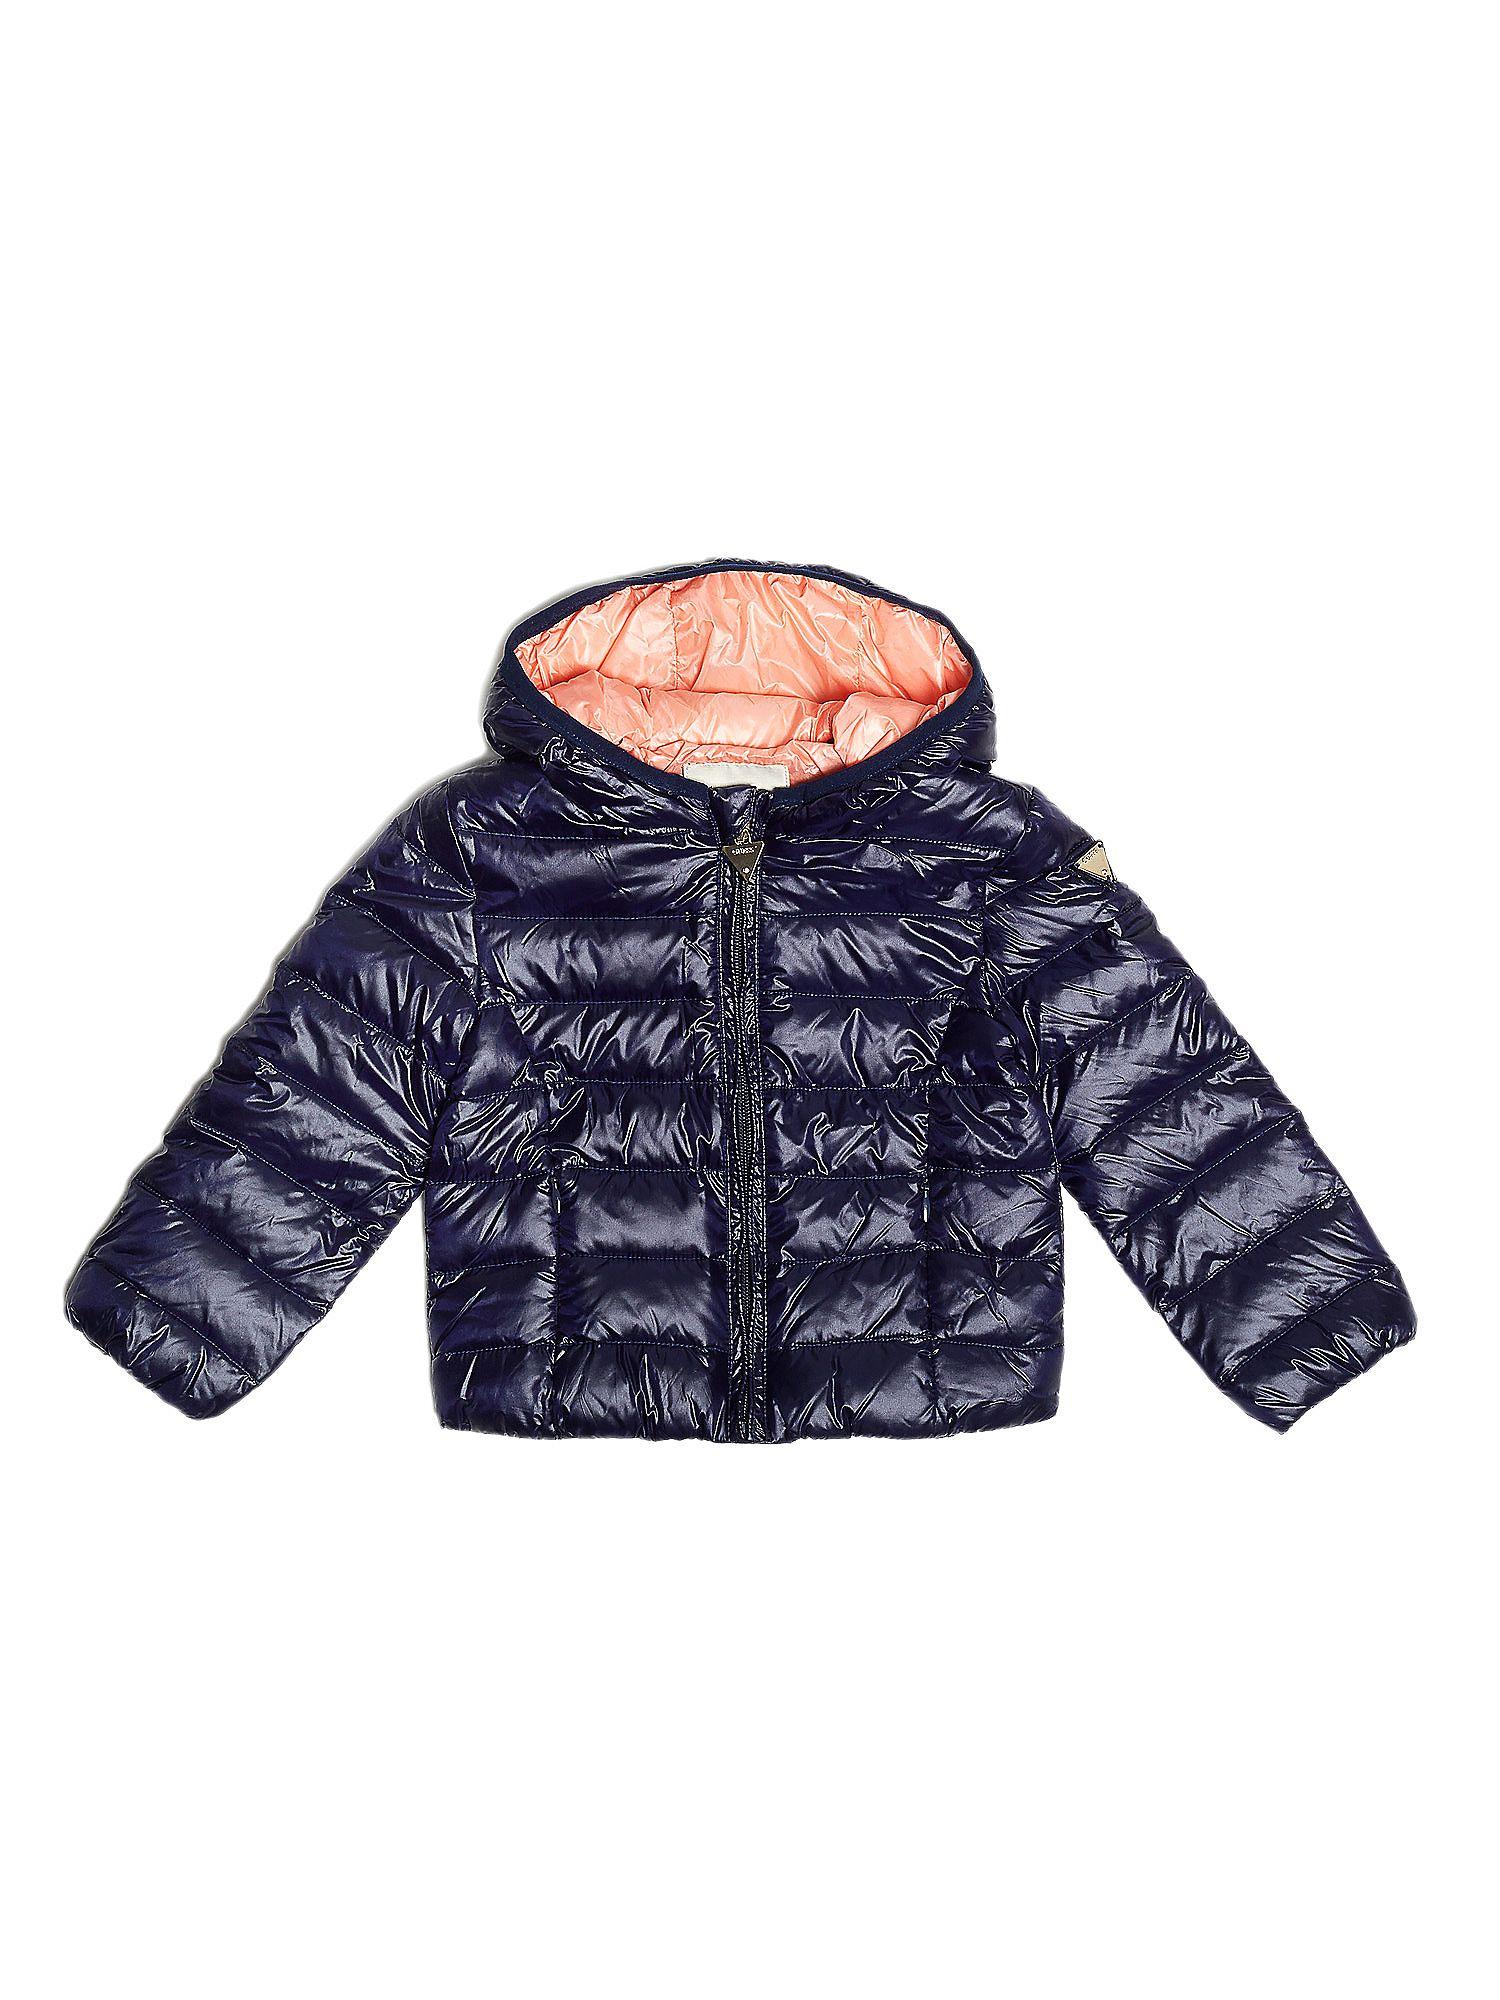 Guess-Kids-Duvet-Coat.jpeg